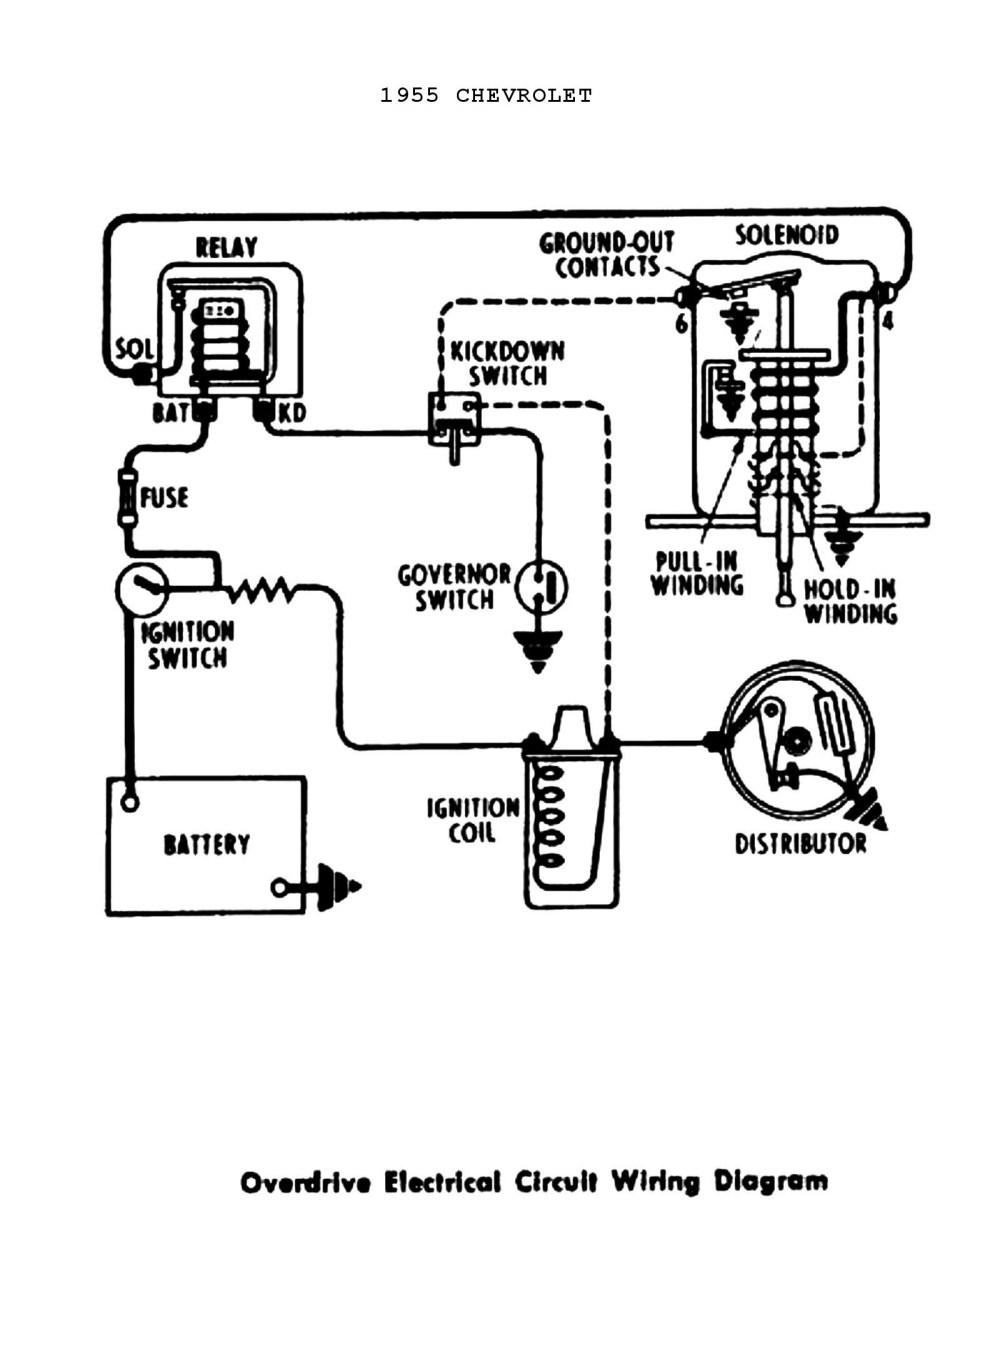 medium resolution of 1955 chevy bel air turn signal wiring diagram electrical work rh wiringdiagramshop today 1955 chevrolet bel 1959